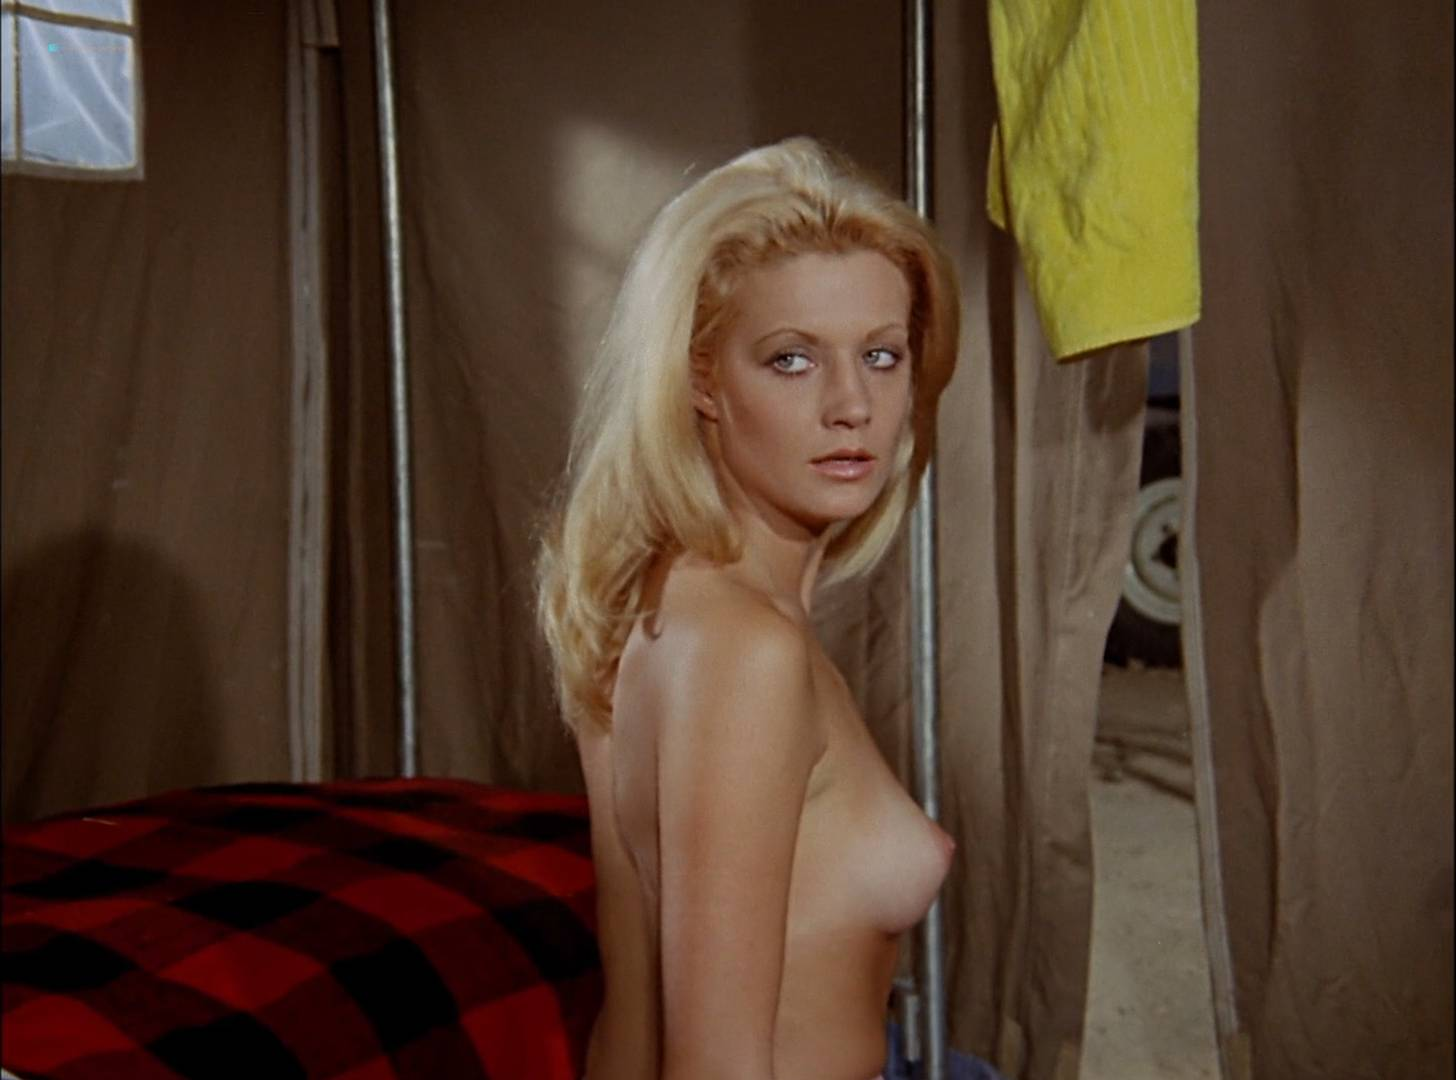 Barbara Rey Porno bárbara rey nude topless kali hansa and other s nude sex the